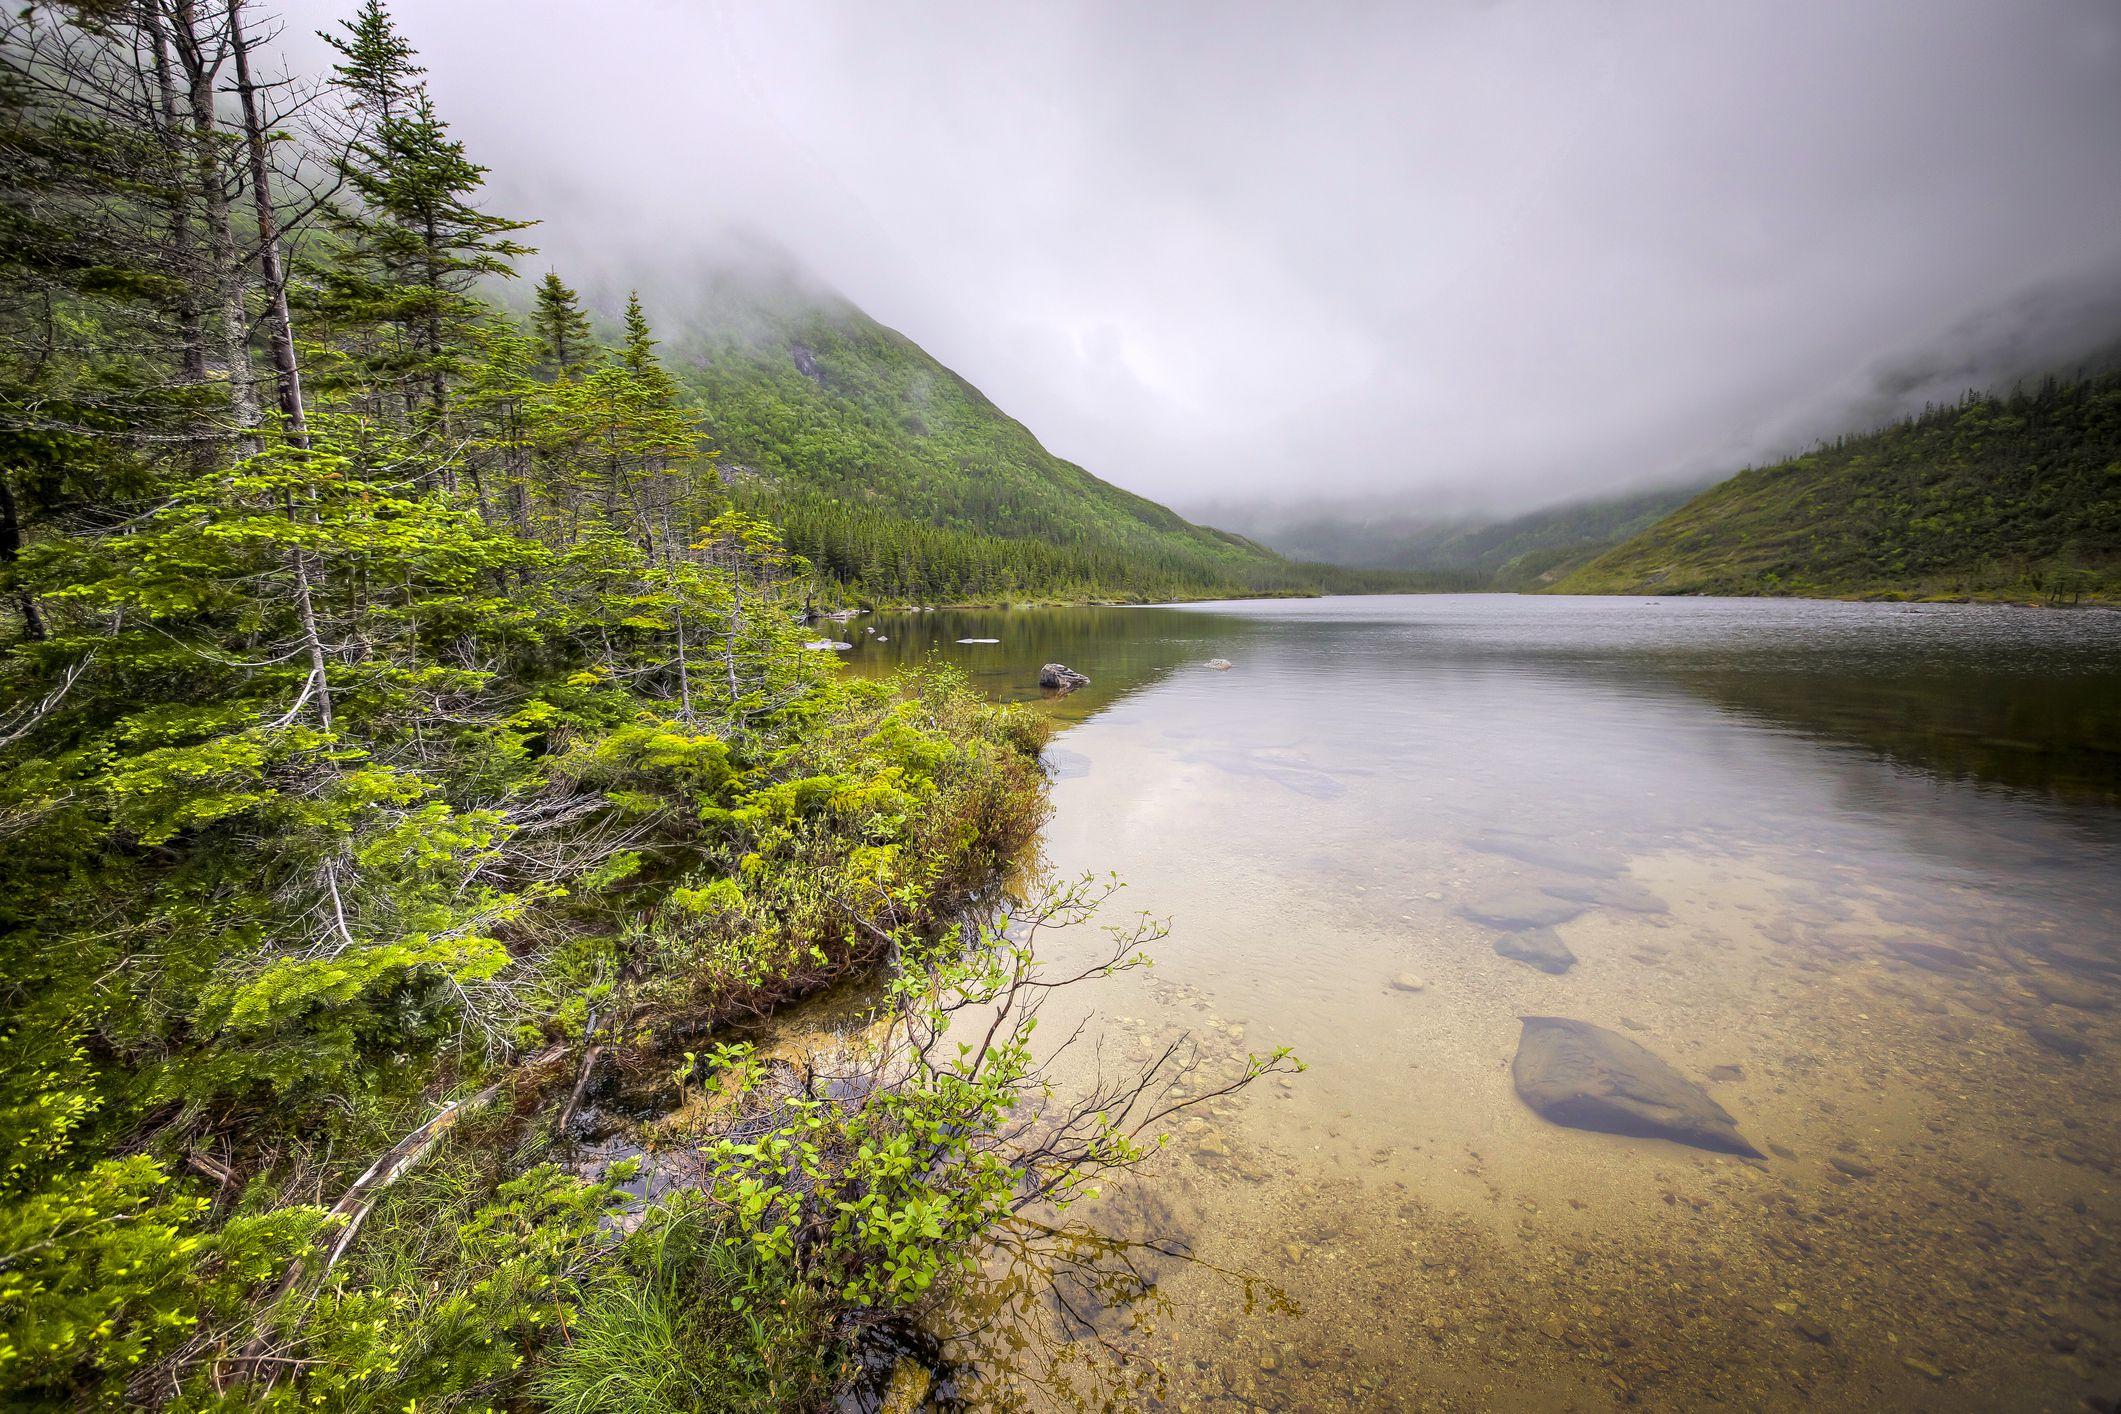 Parque Nacional Gaspesie